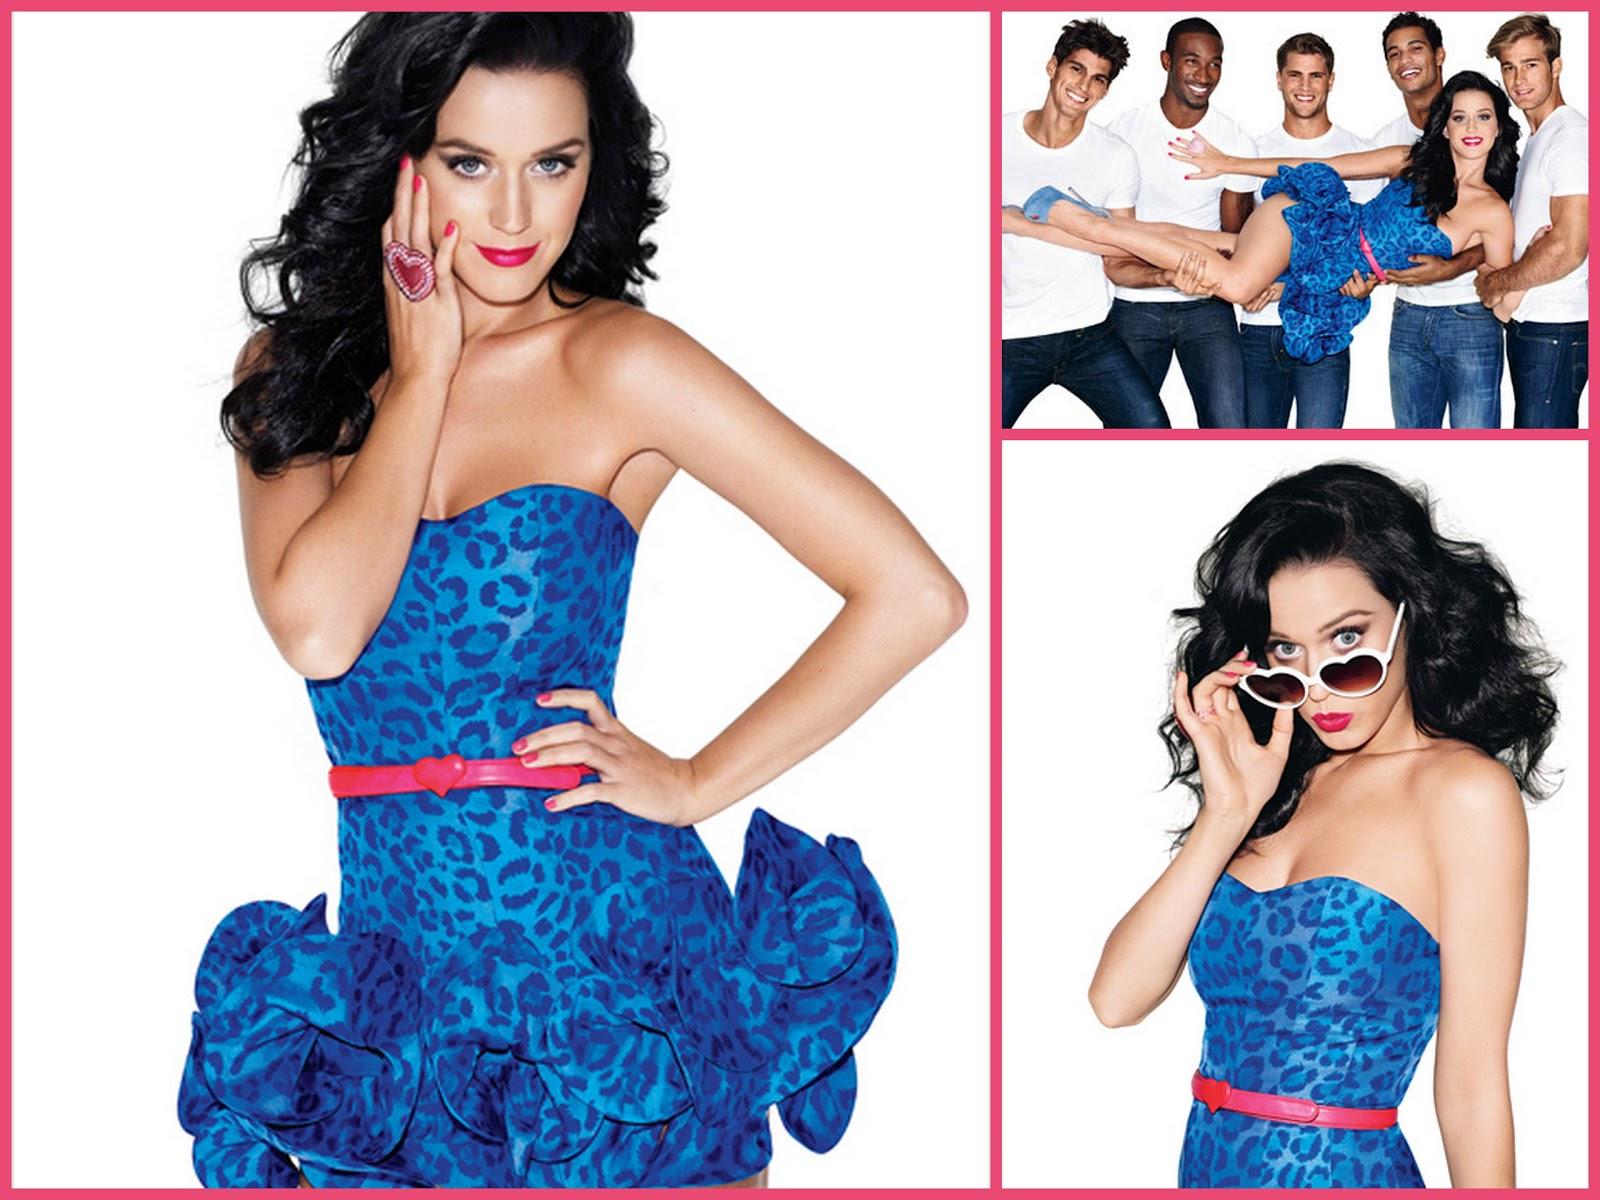 http://3.bp.blogspot.com/-f9fK984yMd8/Th2tTugnM2I/AAAAAAAAhCg/XUs8COMwicA/s1600/Katy+perry+blue+leopard+print+dress+Glamour+magazine.jpg